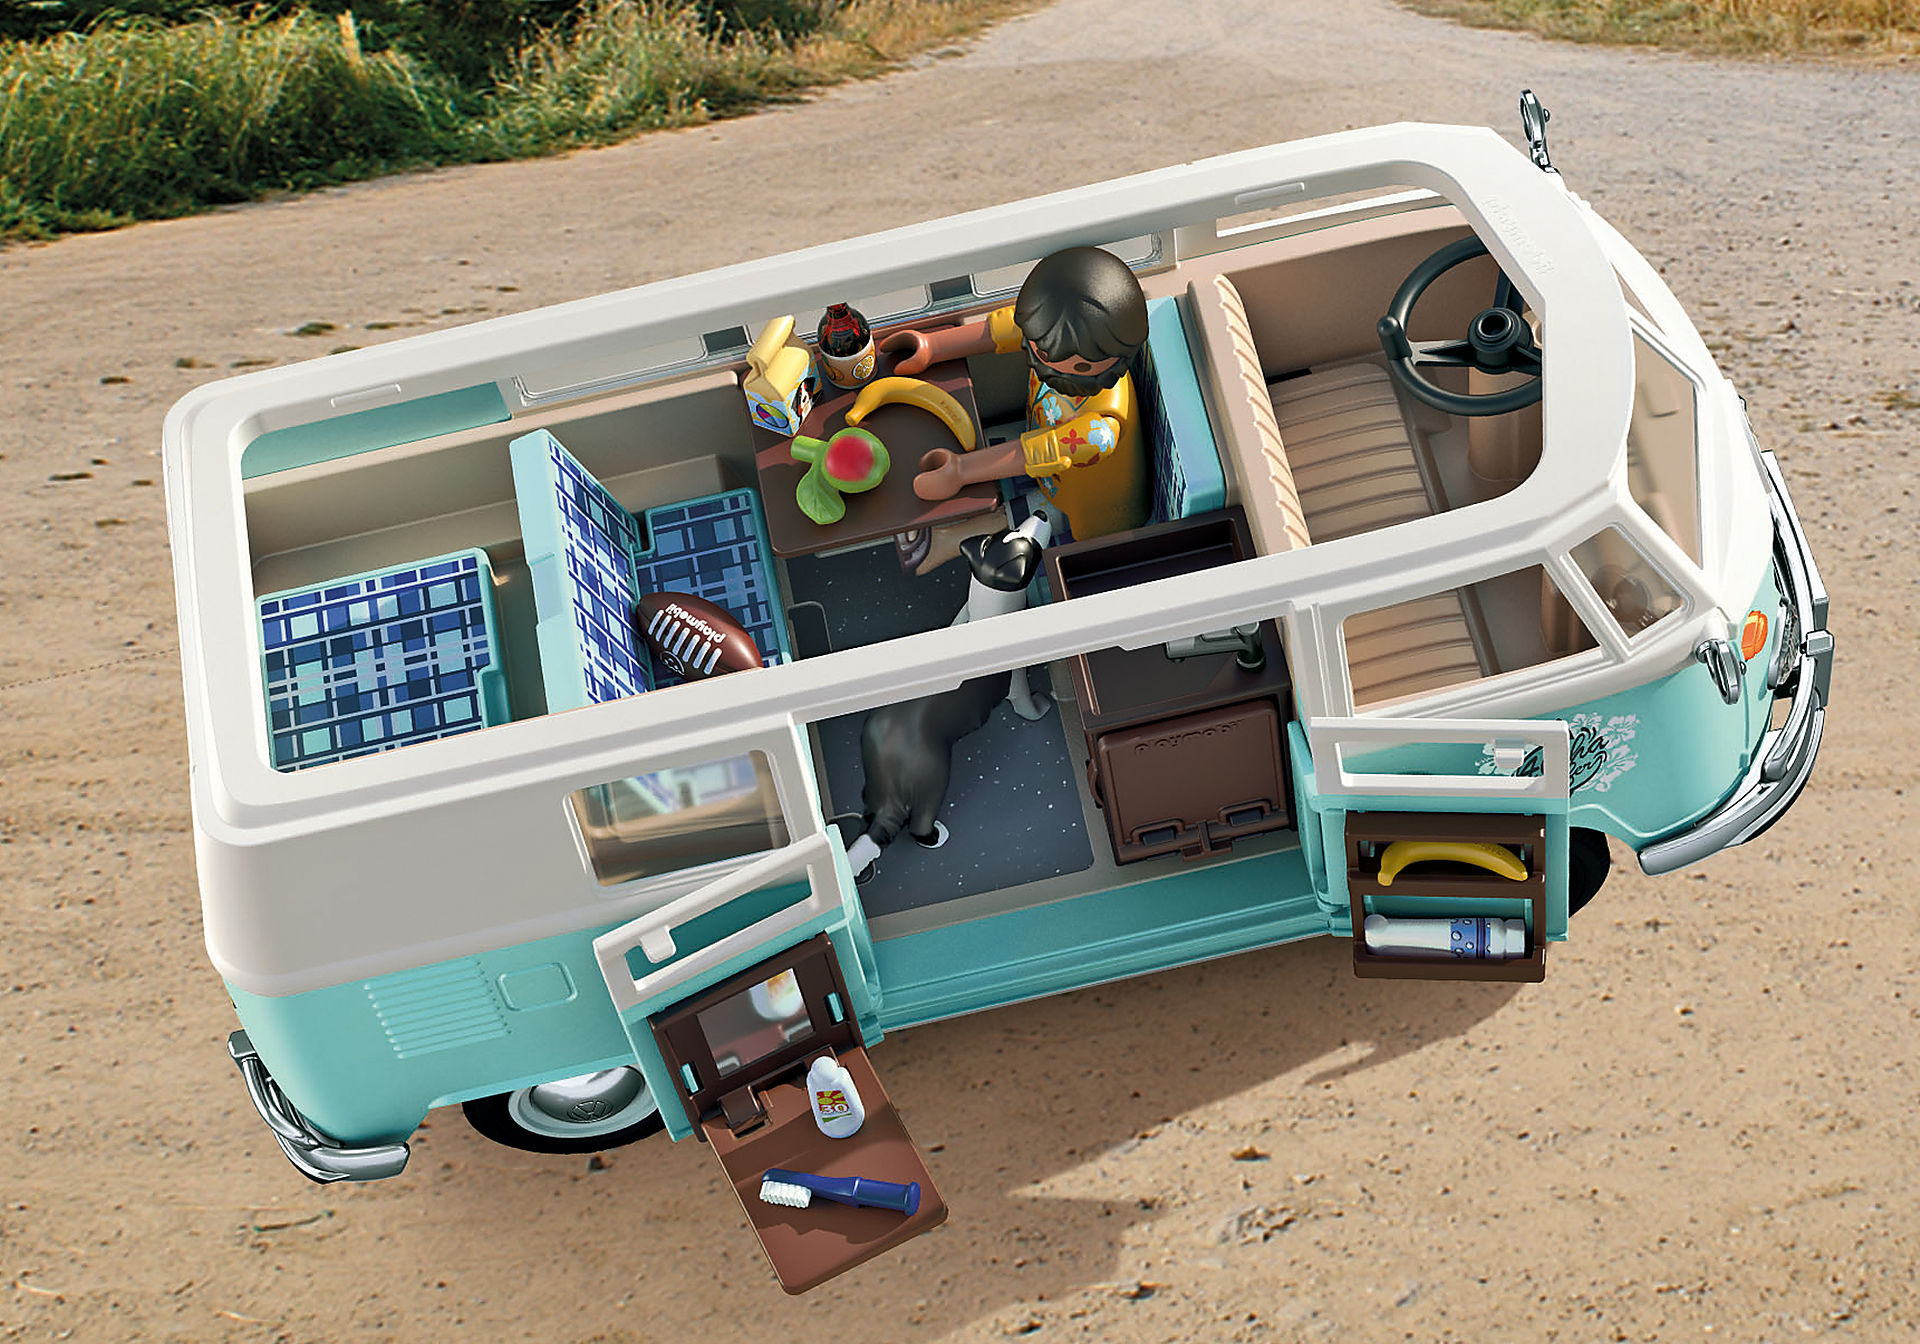 70826 Volkswagen T1 Camping Bus - Edycja specjalna zoom image8